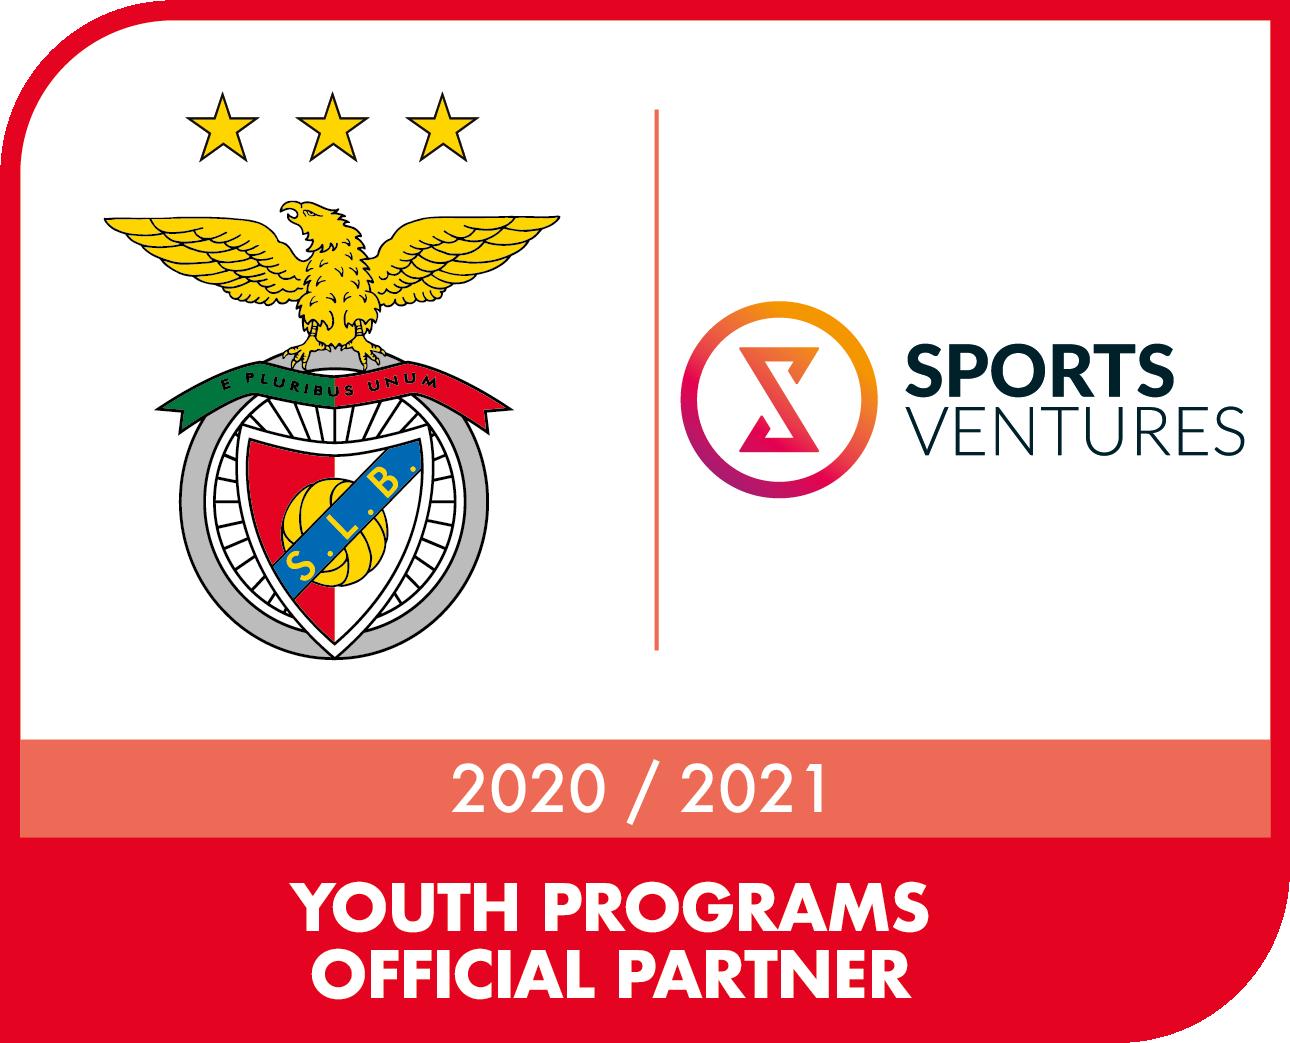 Benfica & Sports Ventures Official Partnership